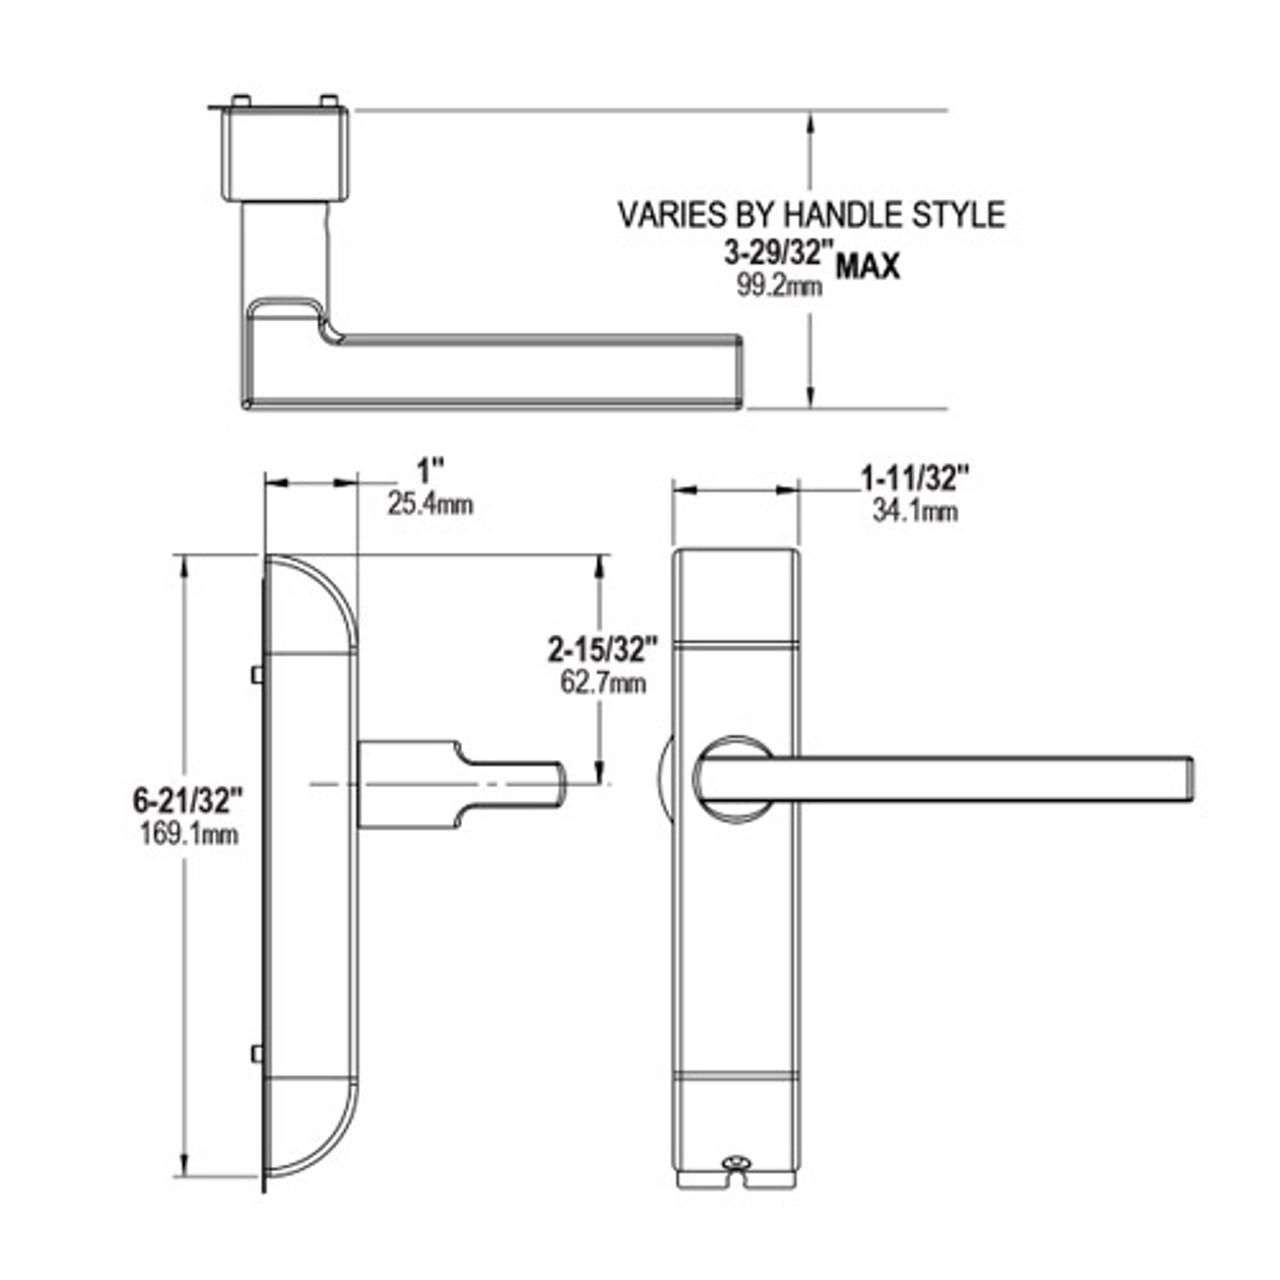 4600-MD-622-US4 Adams Rite MD Designer handle Dimensional View